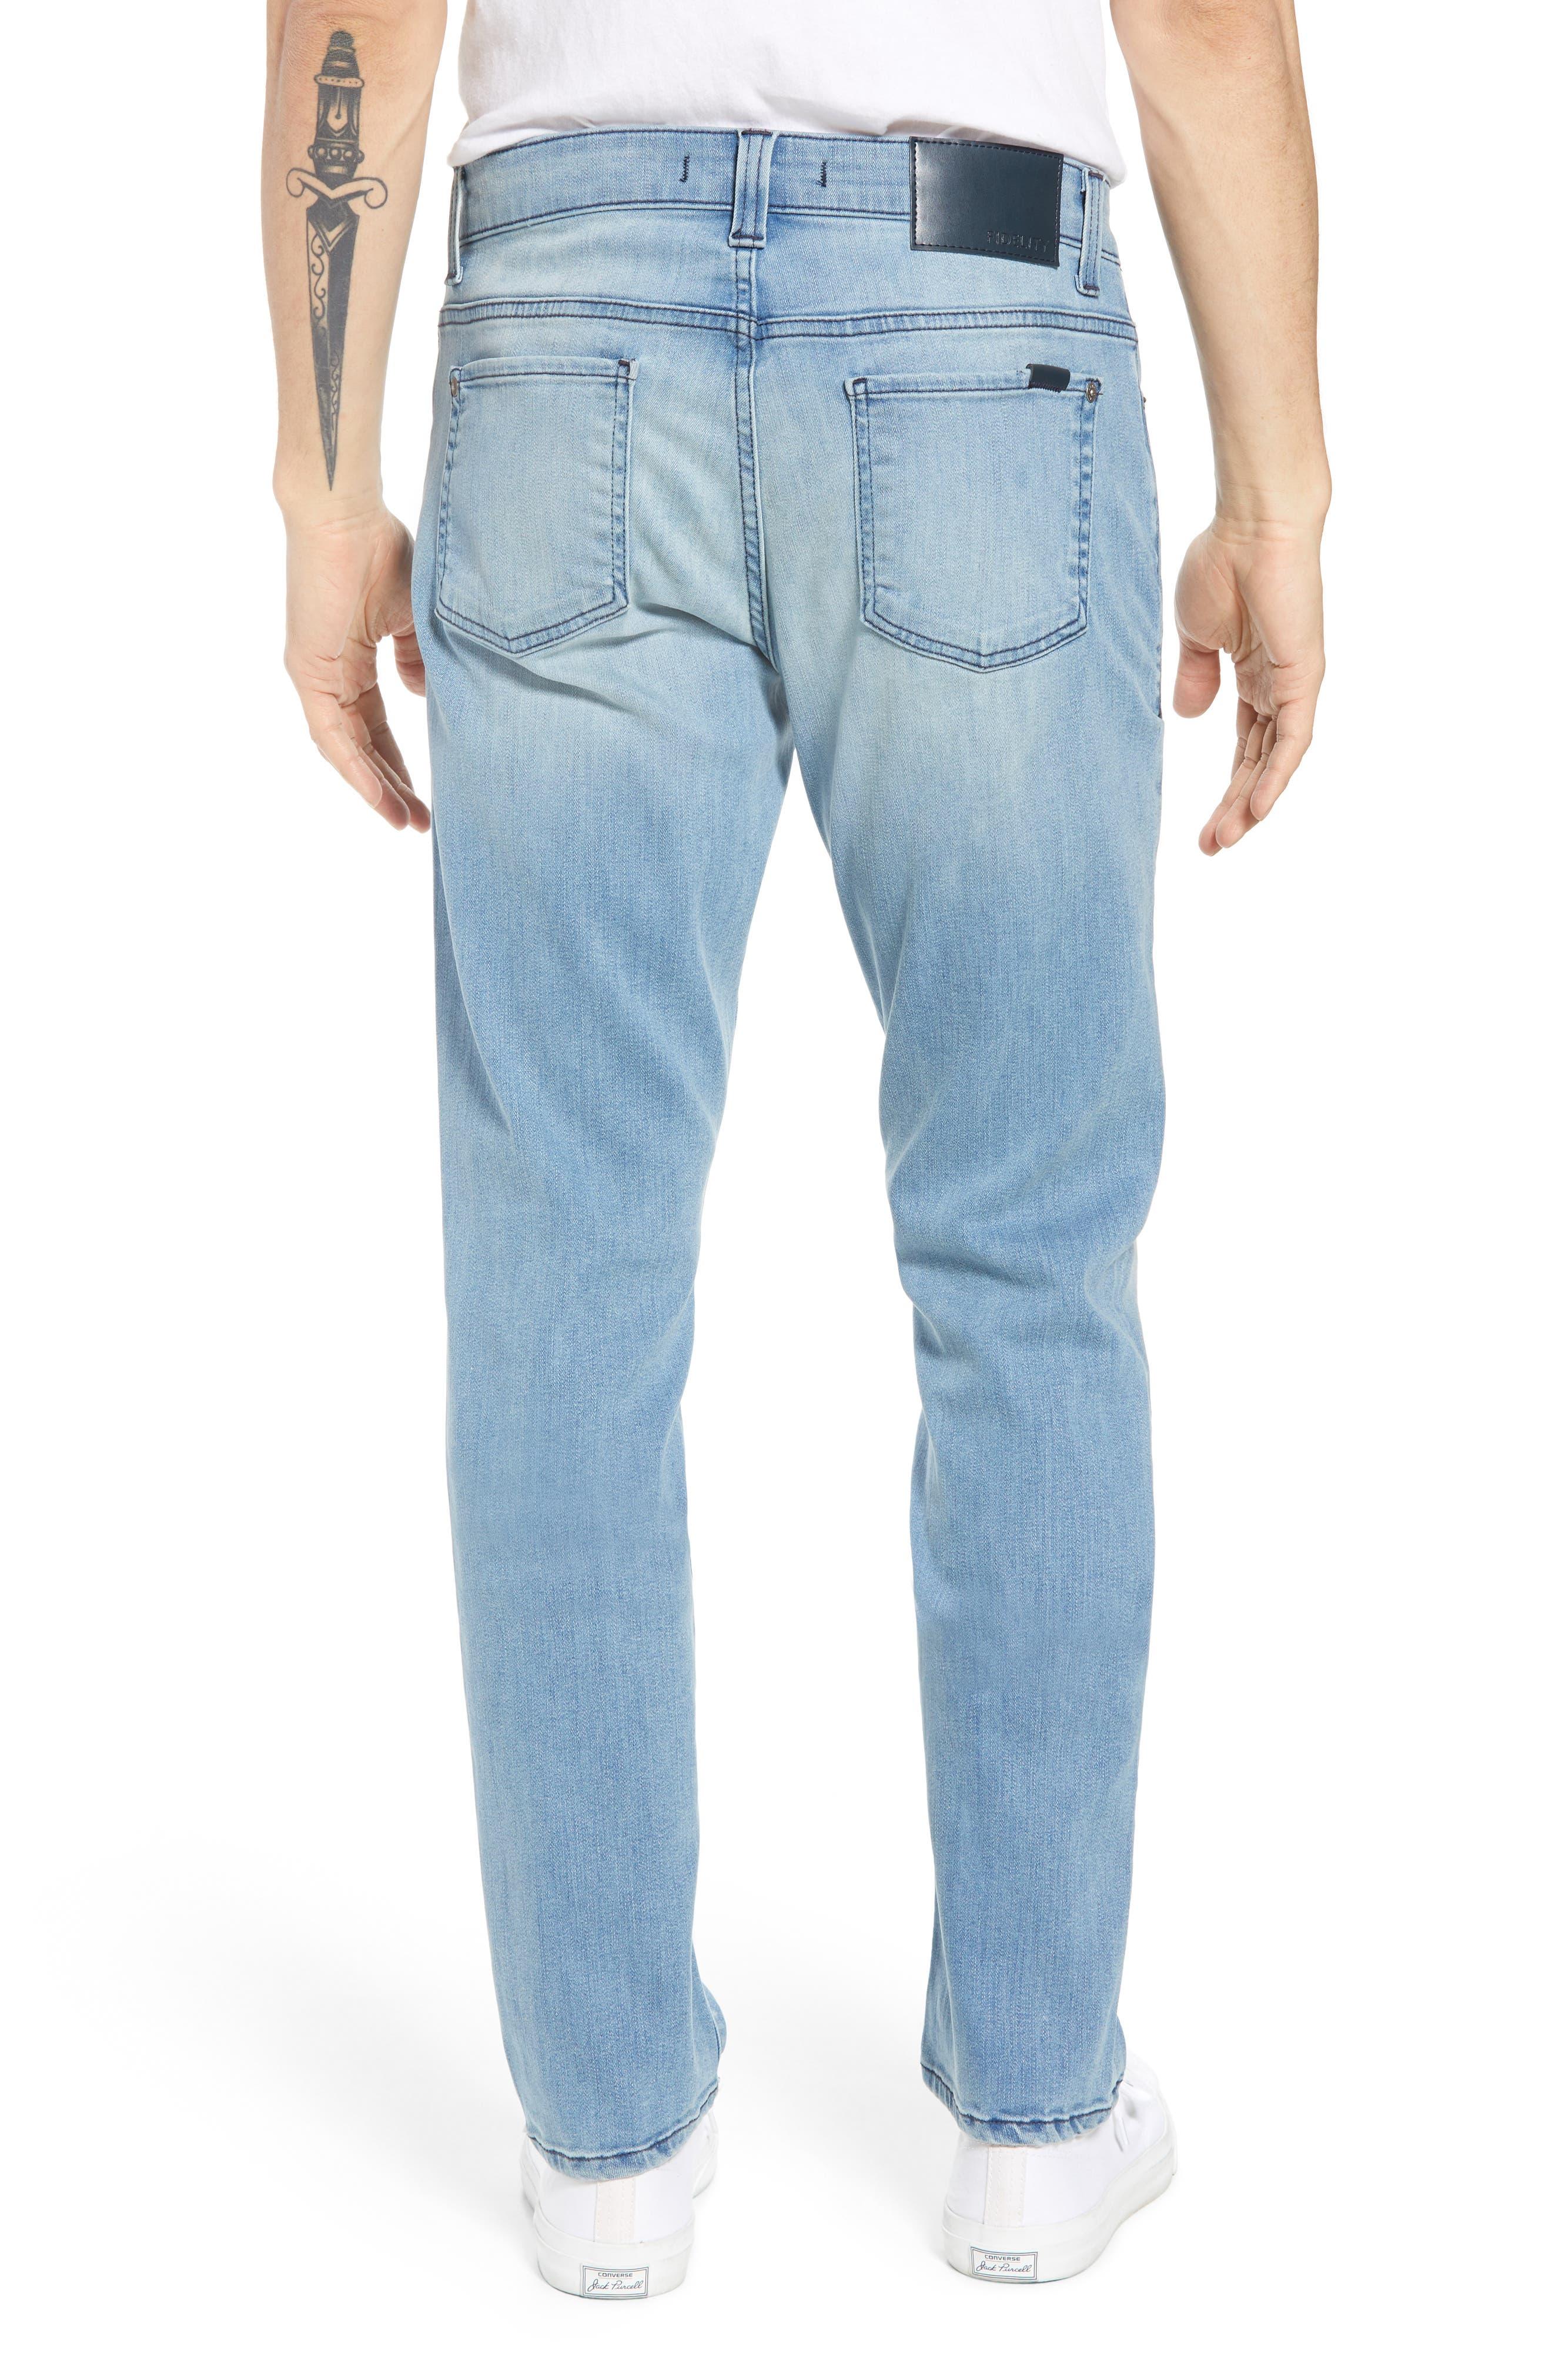 Torino Slim Fit Jeans,                             Alternate thumbnail 2, color,                             Abbey Blue